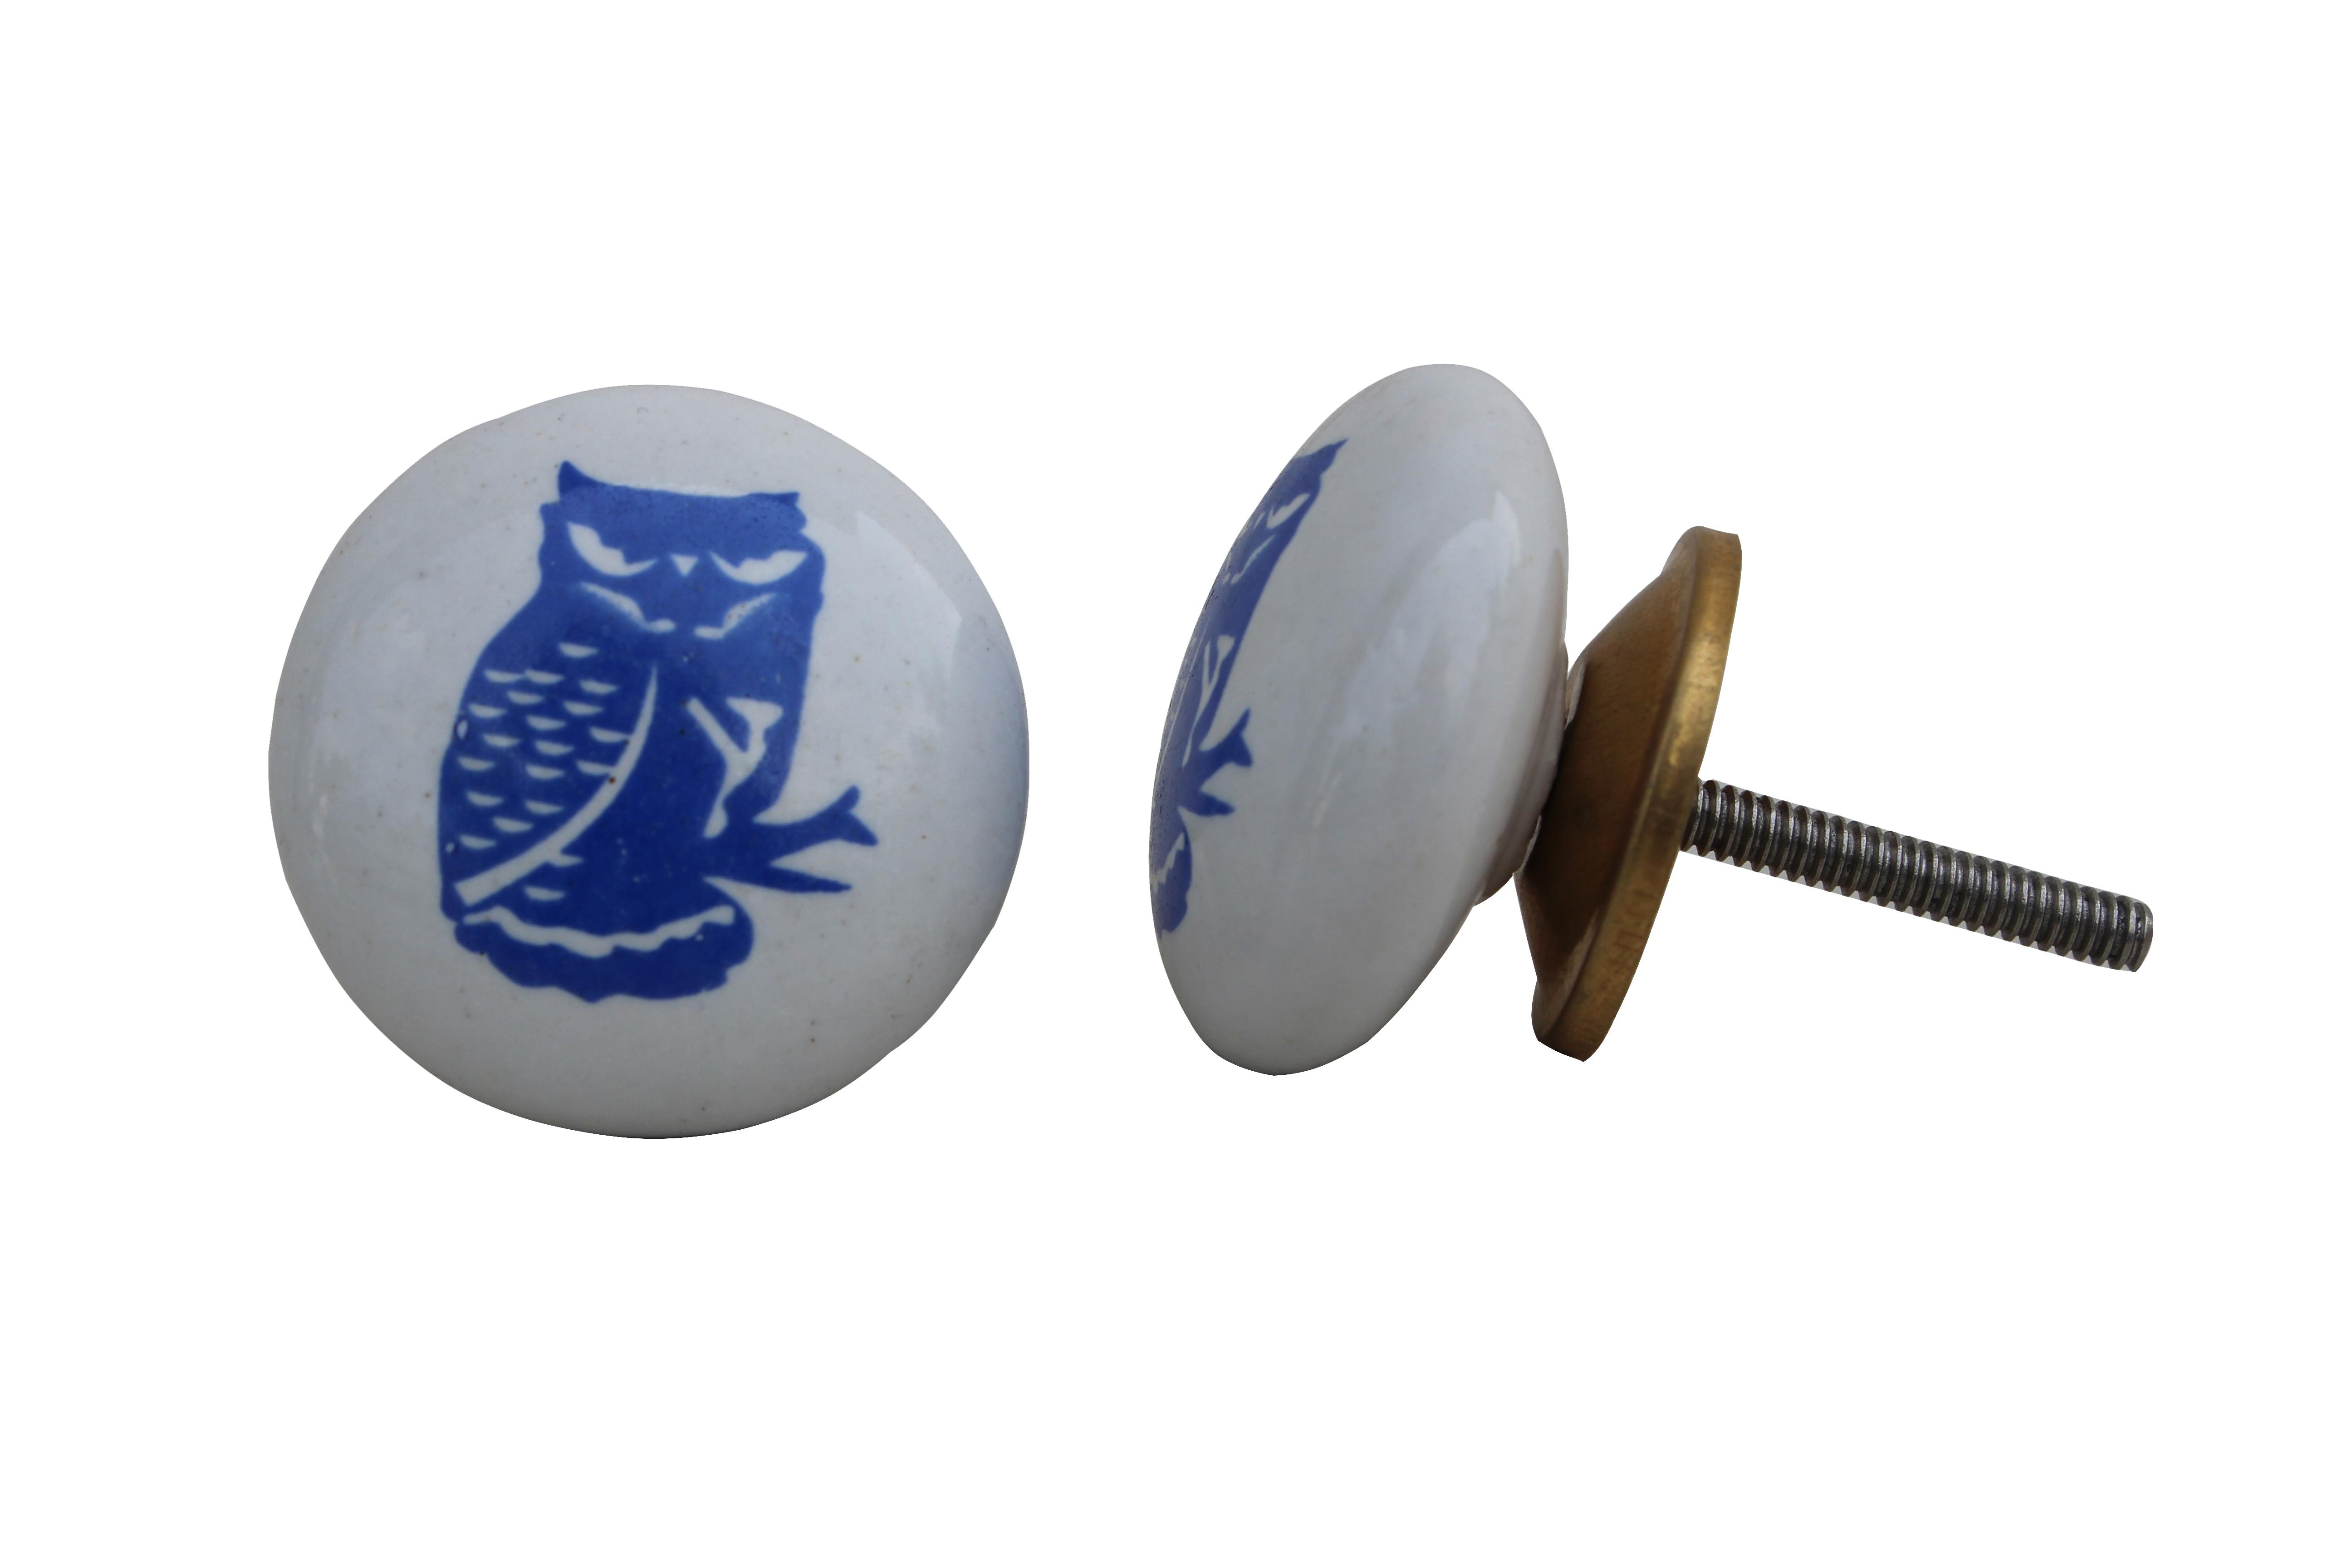 Blue Owl Flat Kids Drawer Knob